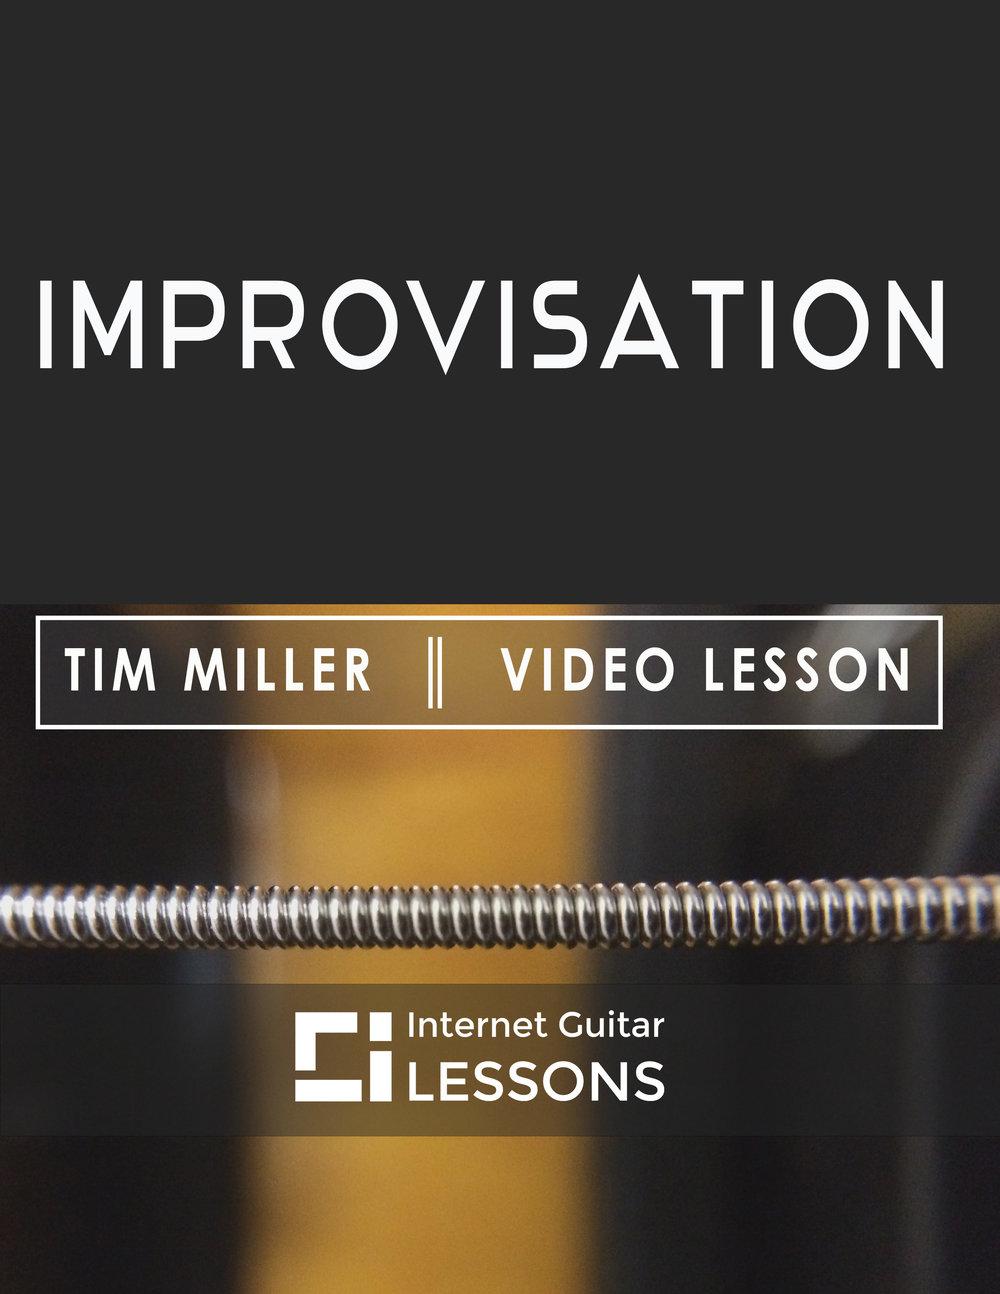 Improvisation 1.17 flat.jpg